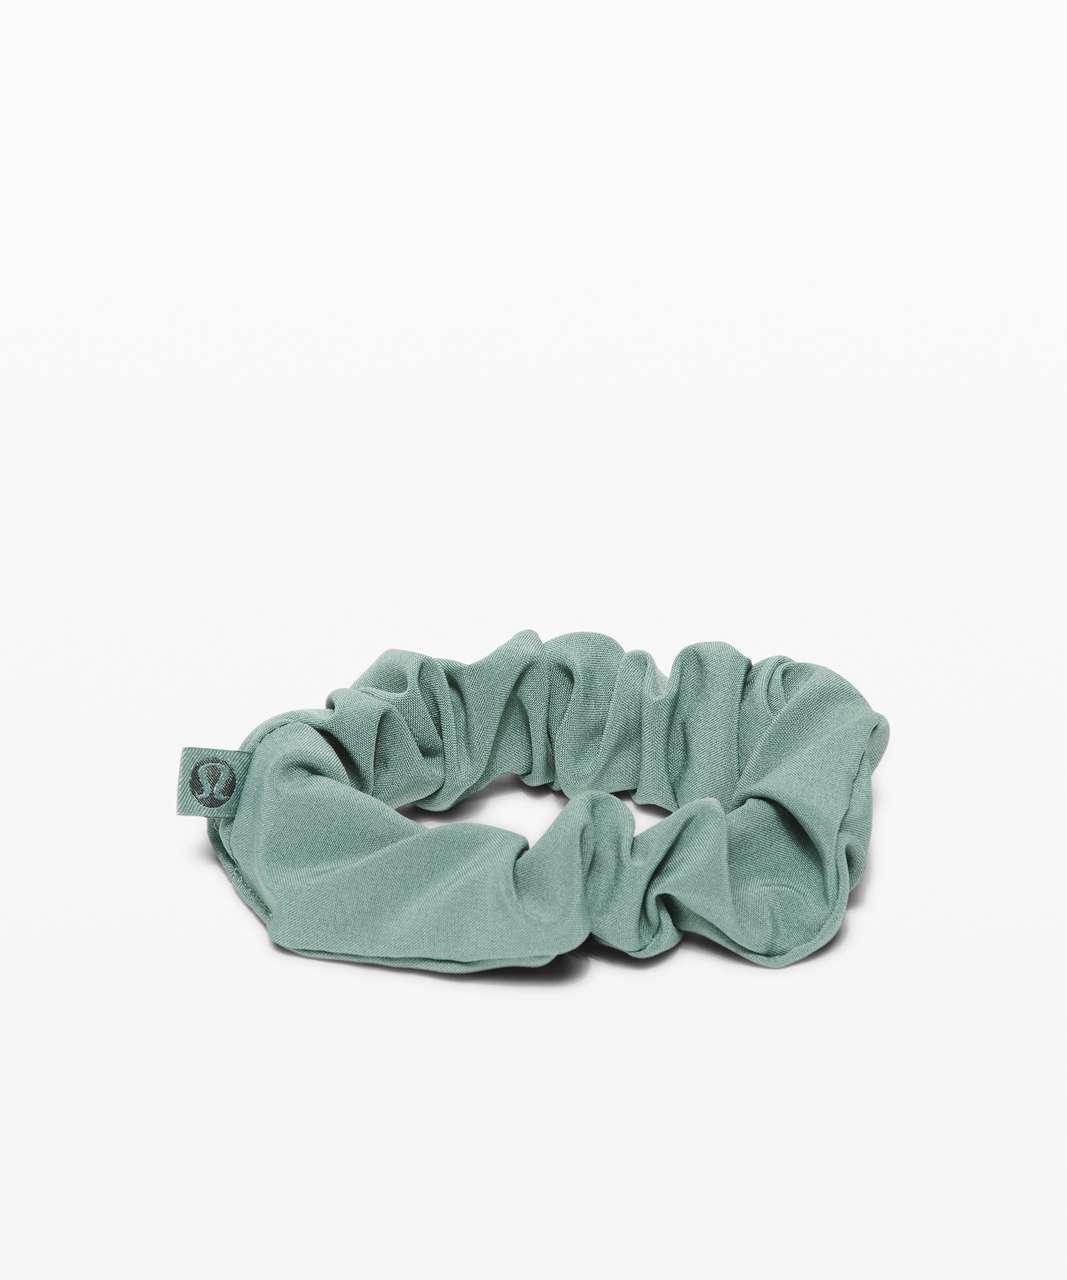 Lululemon Uplifting Scrunchie - Tidewater Teal